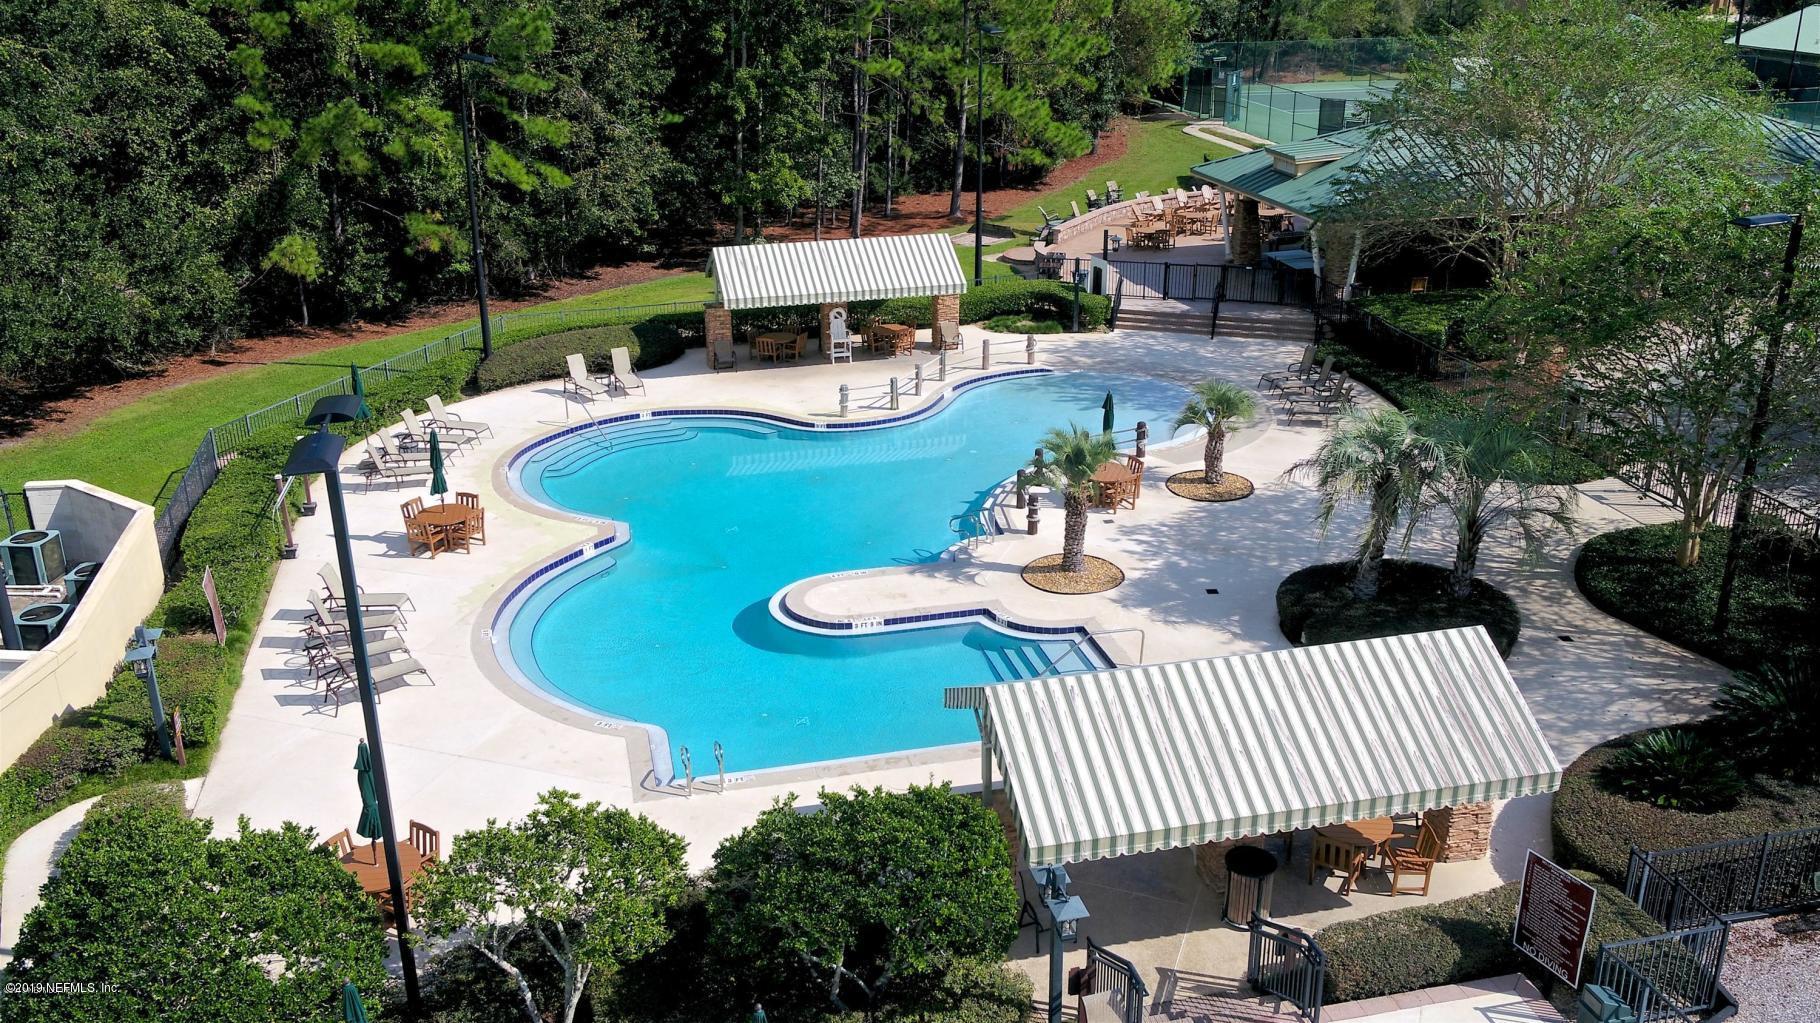 2452 DEN, ST AUGUSTINE, FLORIDA 32092, 4 Bedrooms Bedrooms, ,4 BathroomsBathrooms,Residential - single family,For sale,DEN,1021515